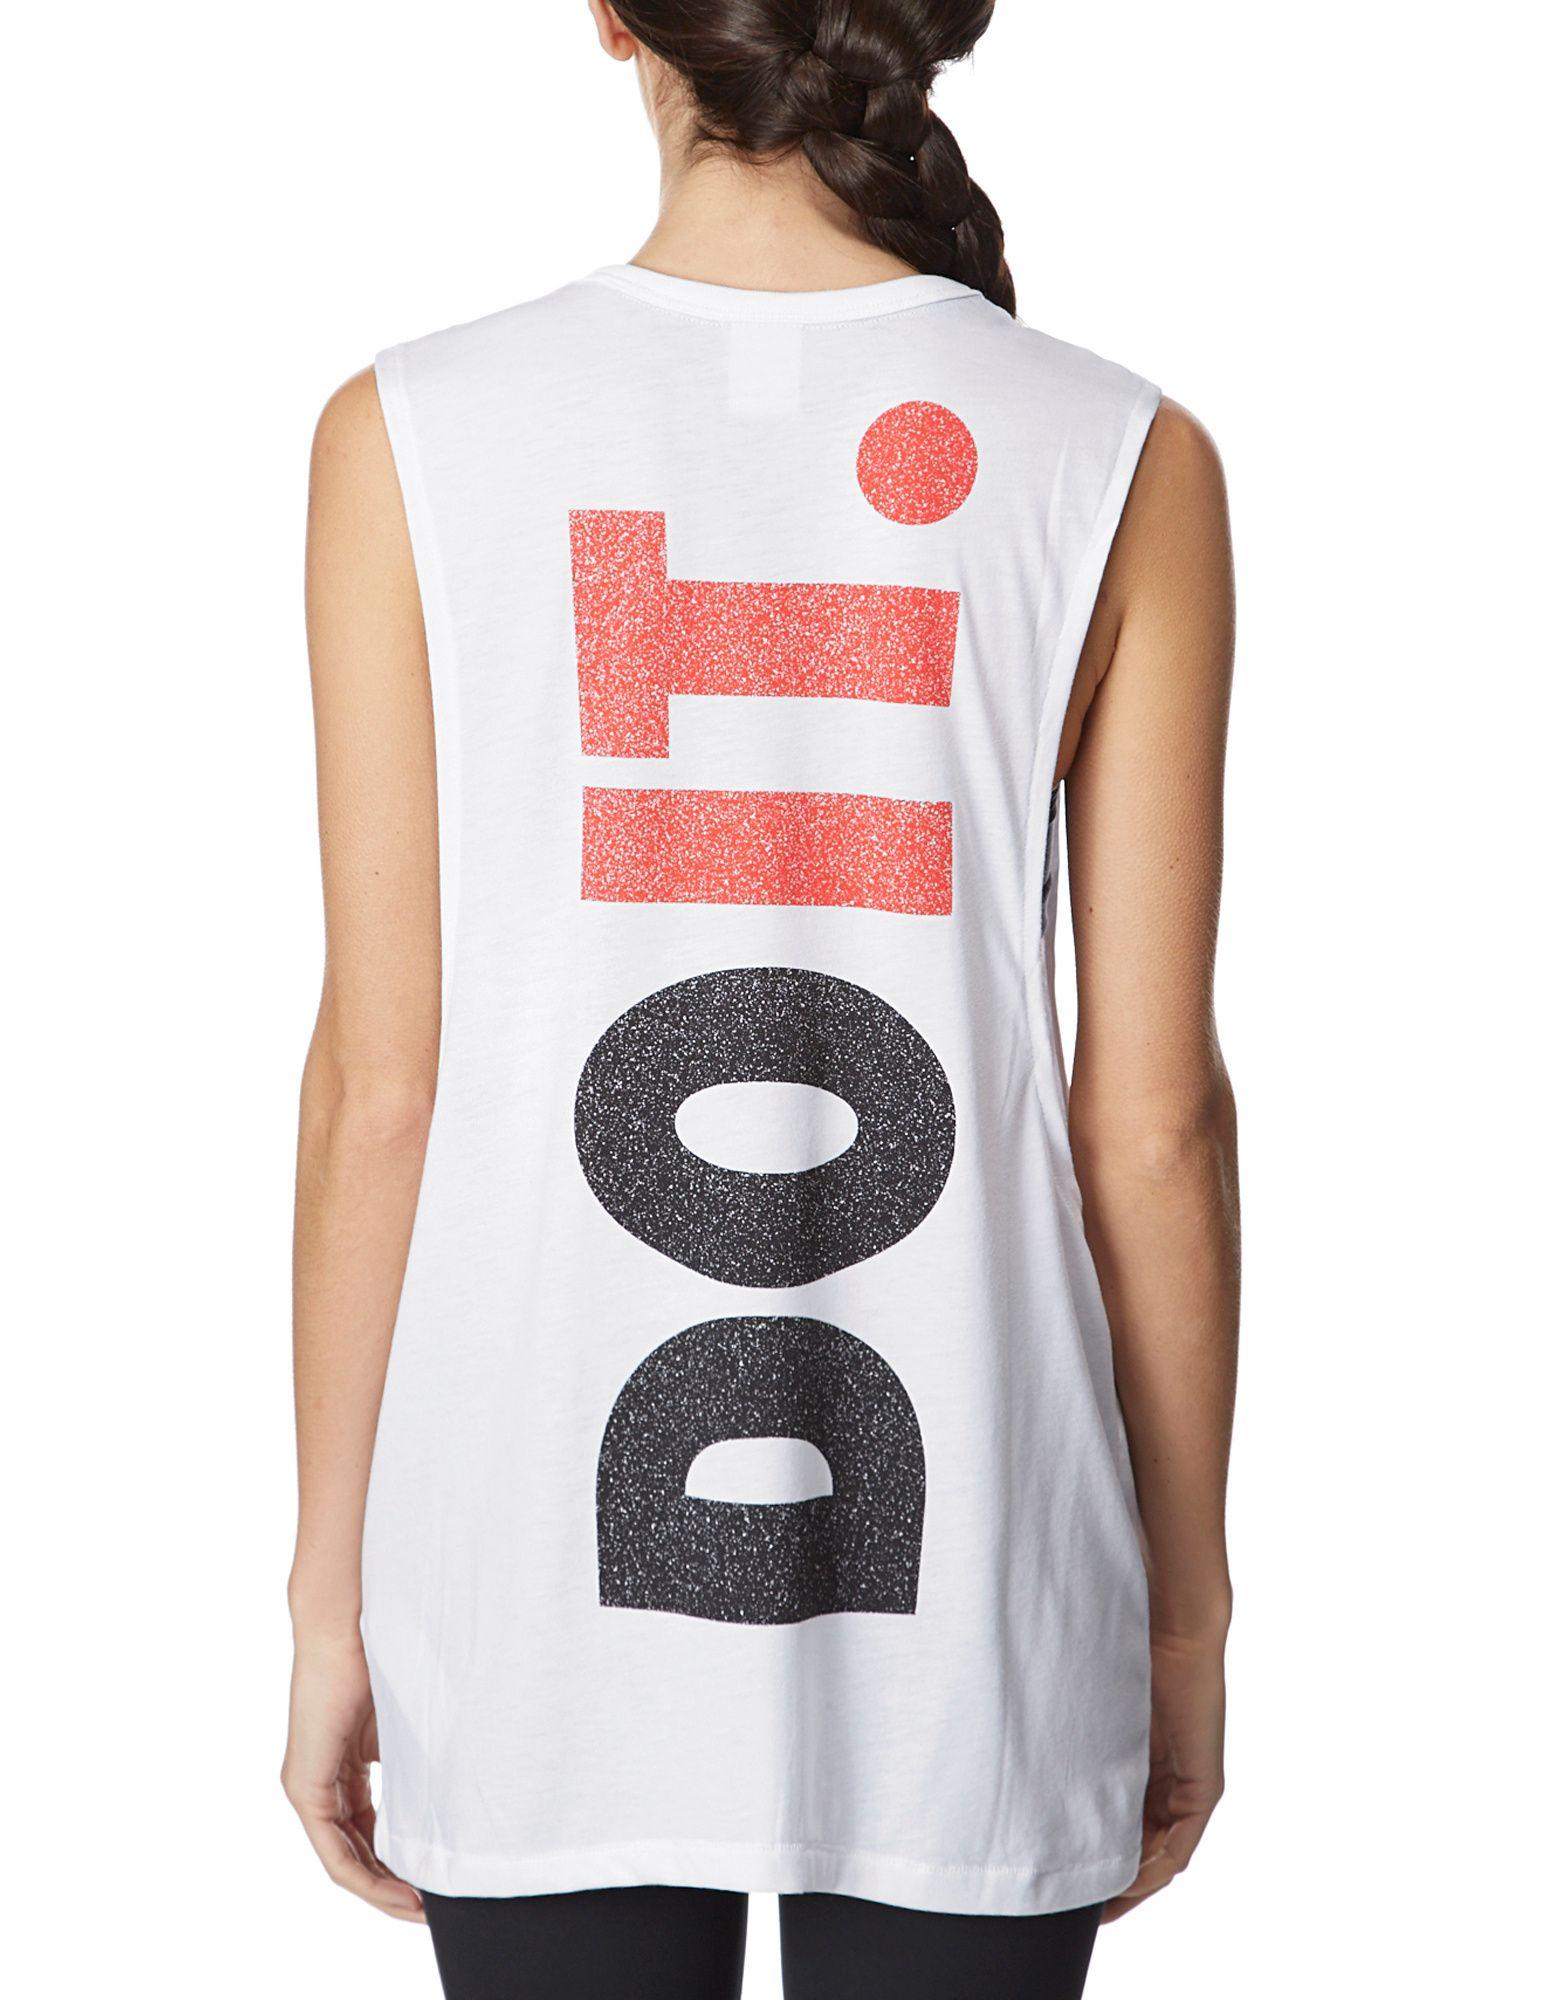 Nike Just Do It Vest